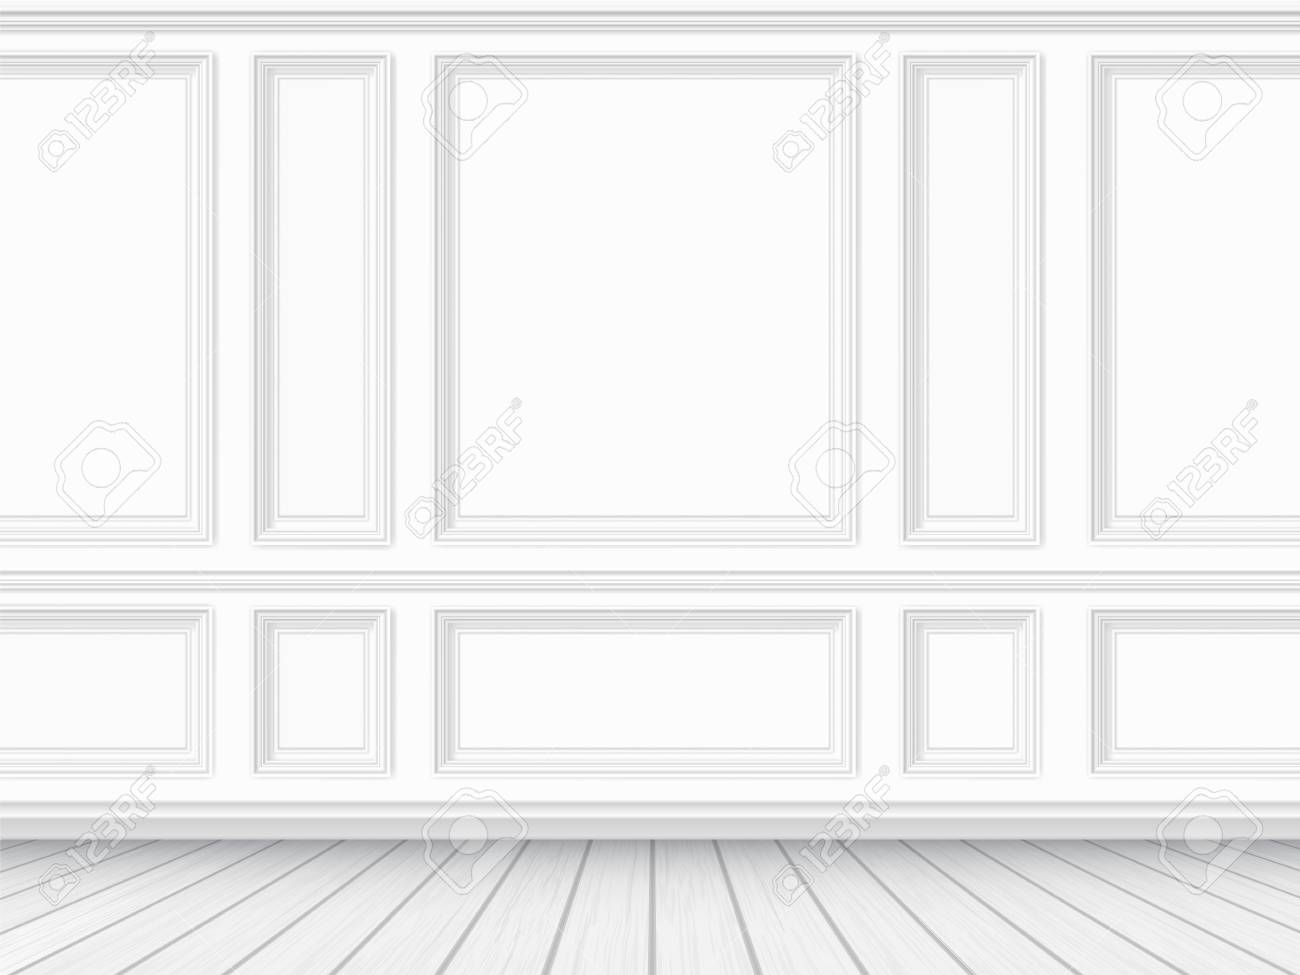 Fabulous Classic Interior Of The Living Room Parquet Floor And White Download Free Architecture Designs Scobabritishbridgeorg